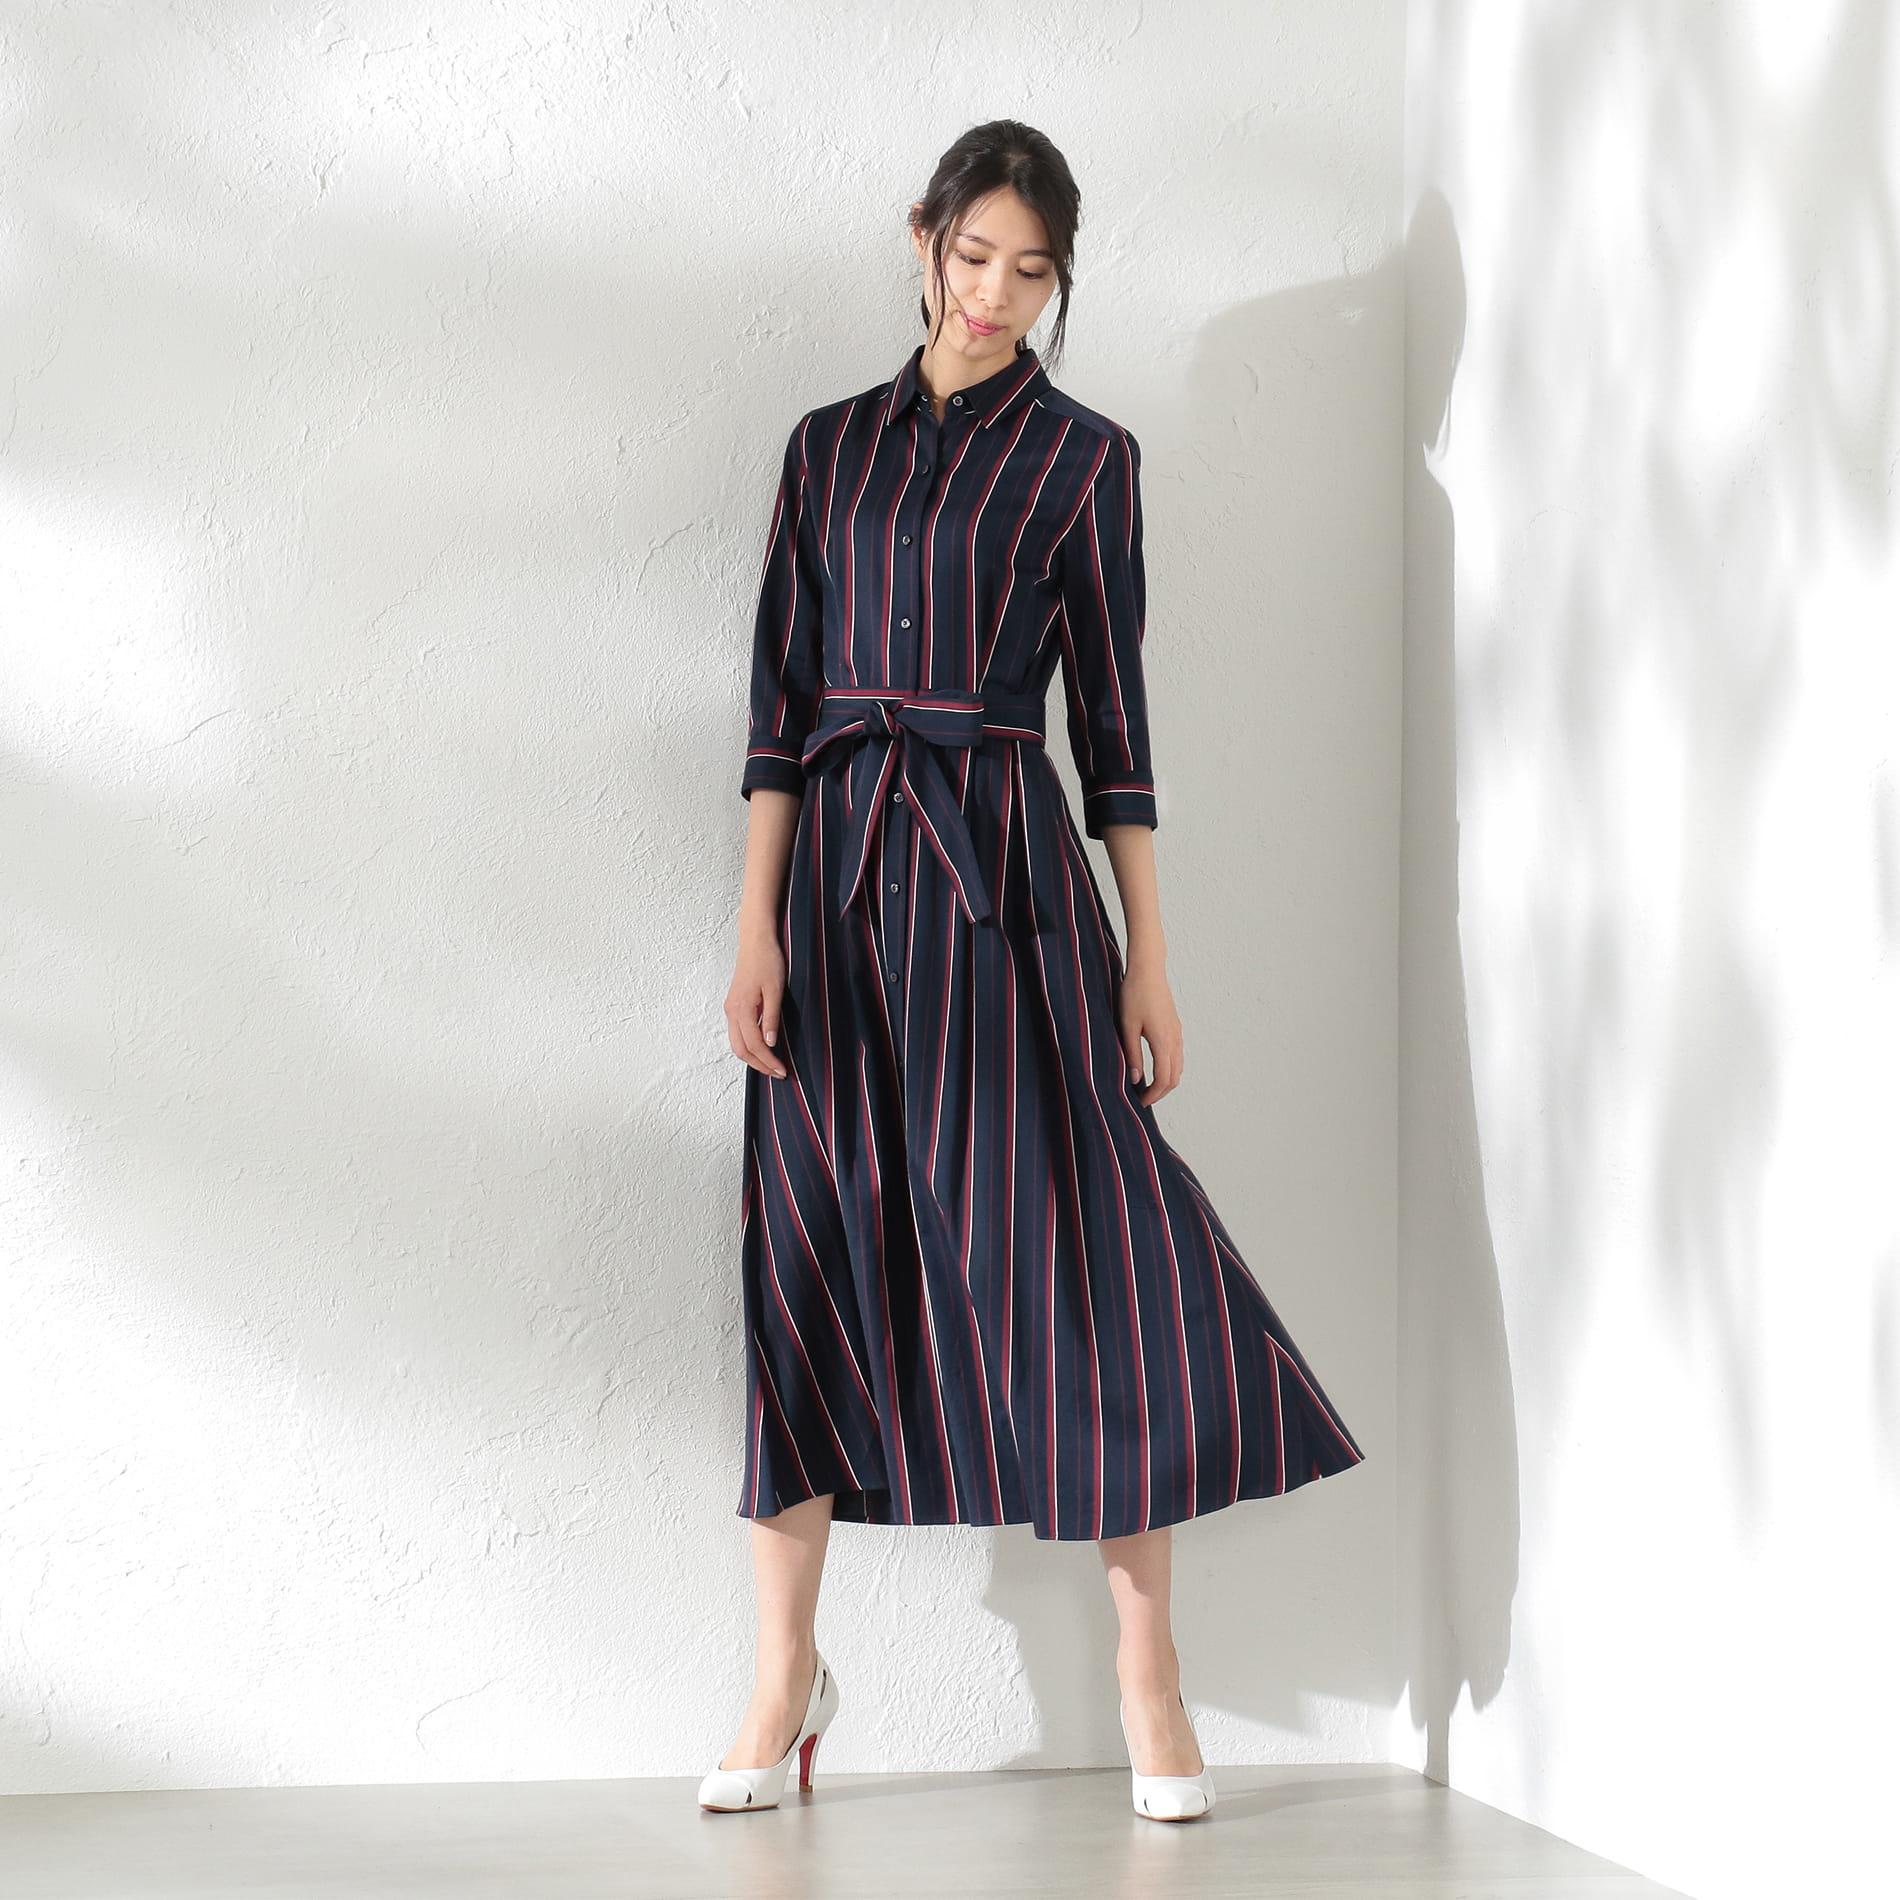 【LOVELESS×otona MUSE】WOMEN レジメンタルストライプシャツドレス